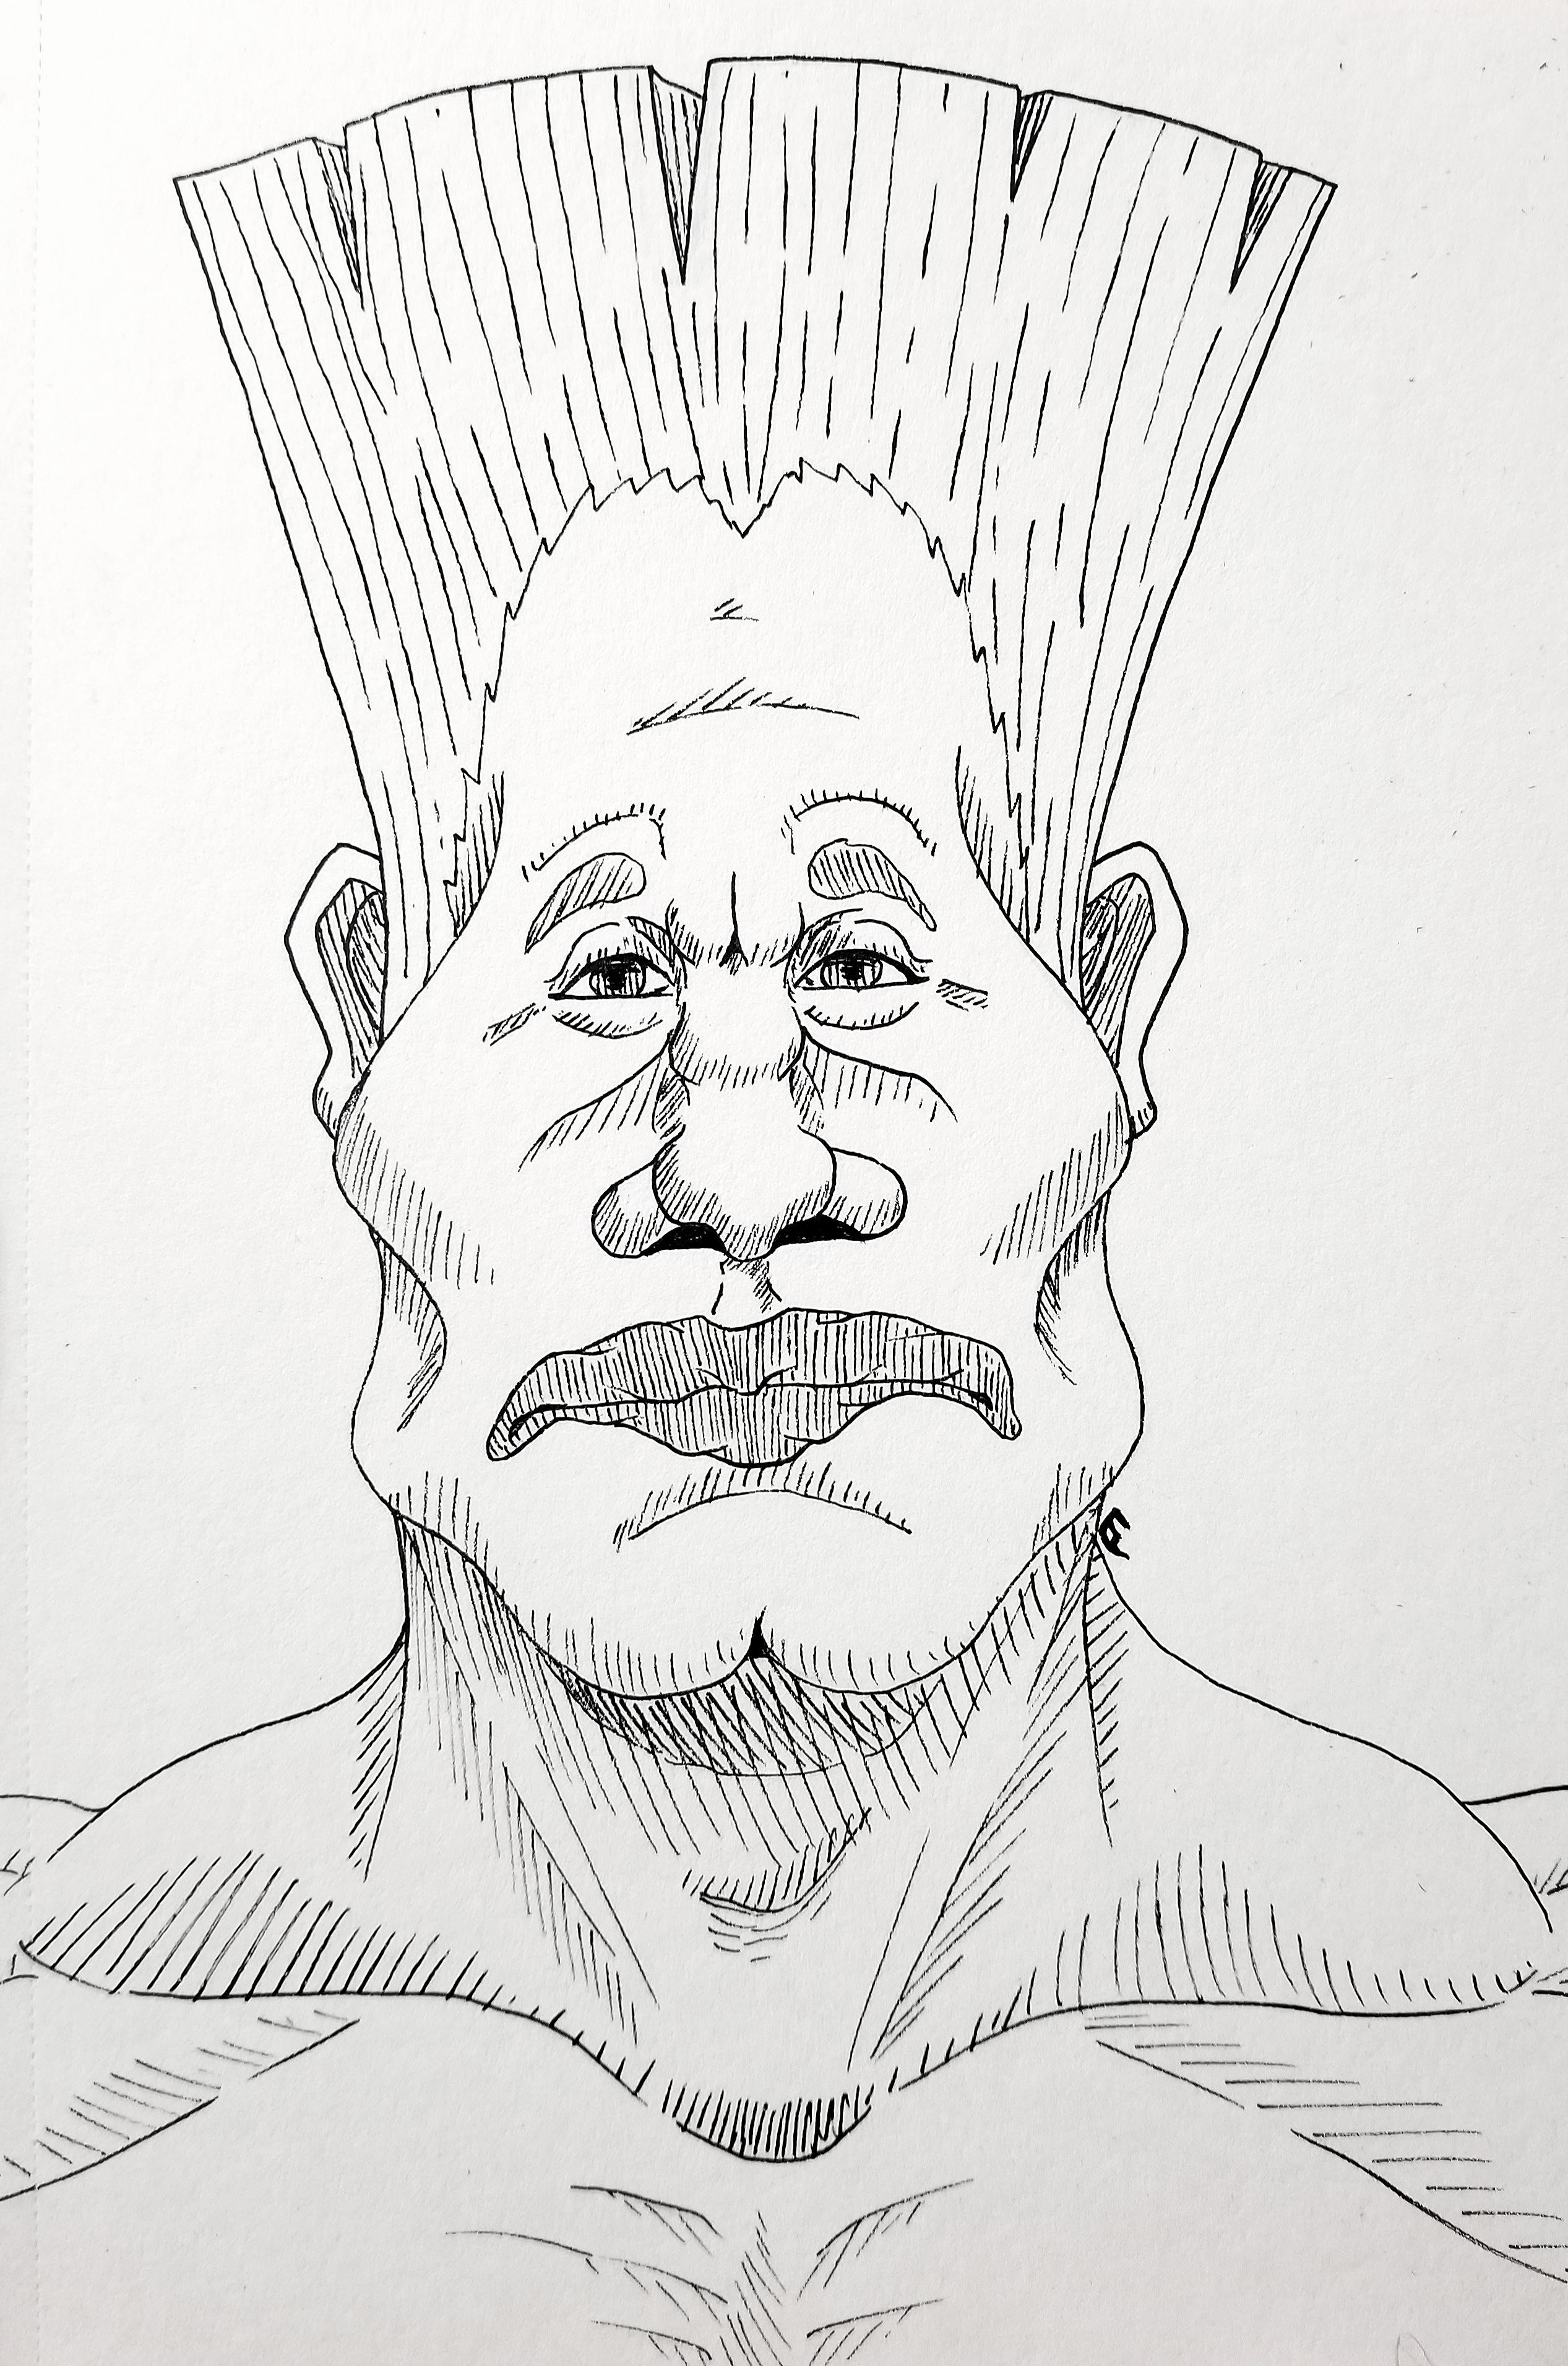 Inktober Day 12: Somber Dry-lipped Man